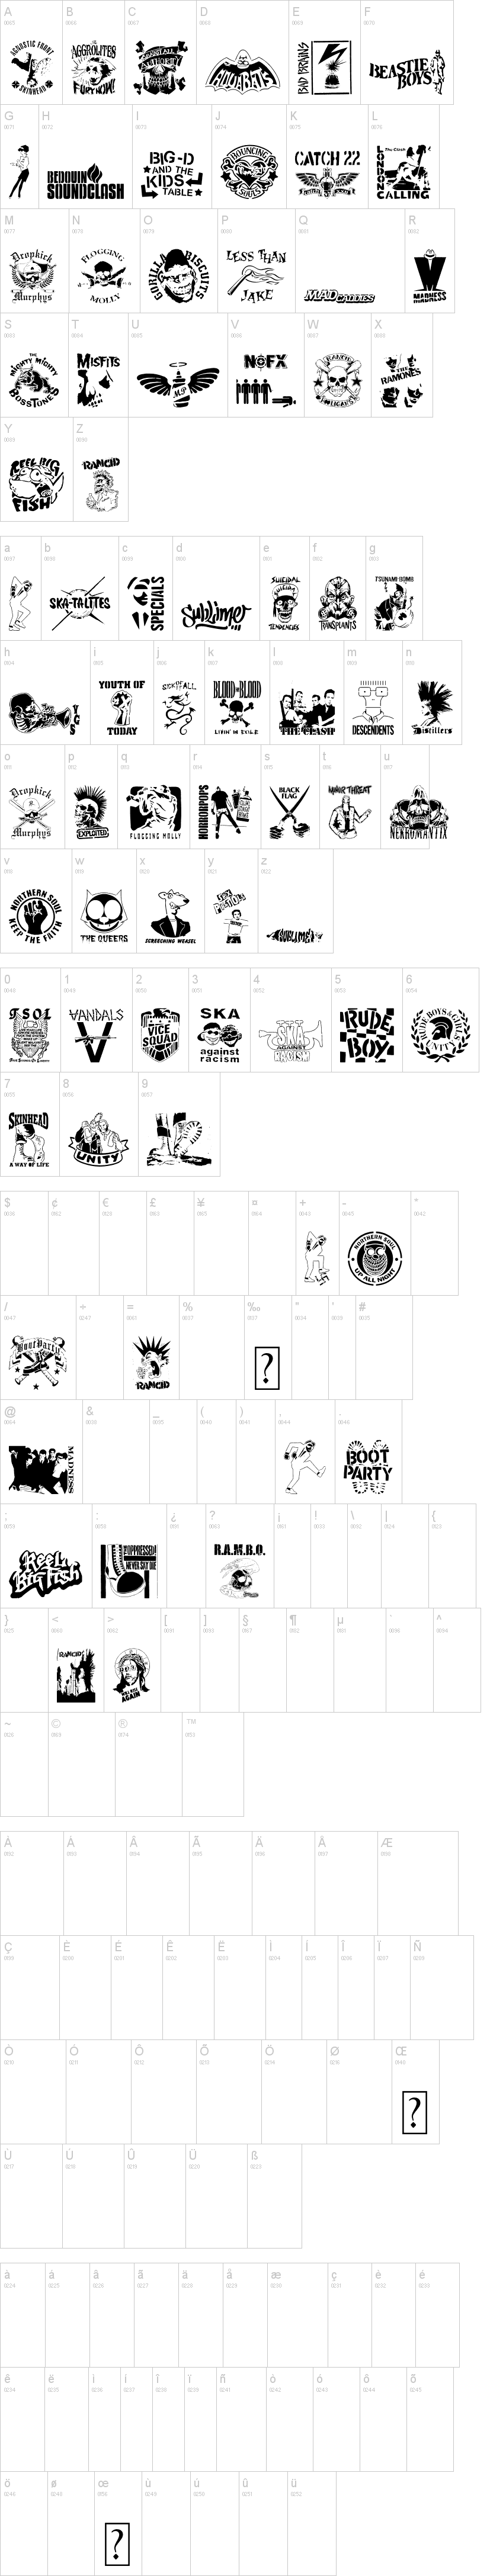 Stencil punks band logos the good word of punk diy pinterest